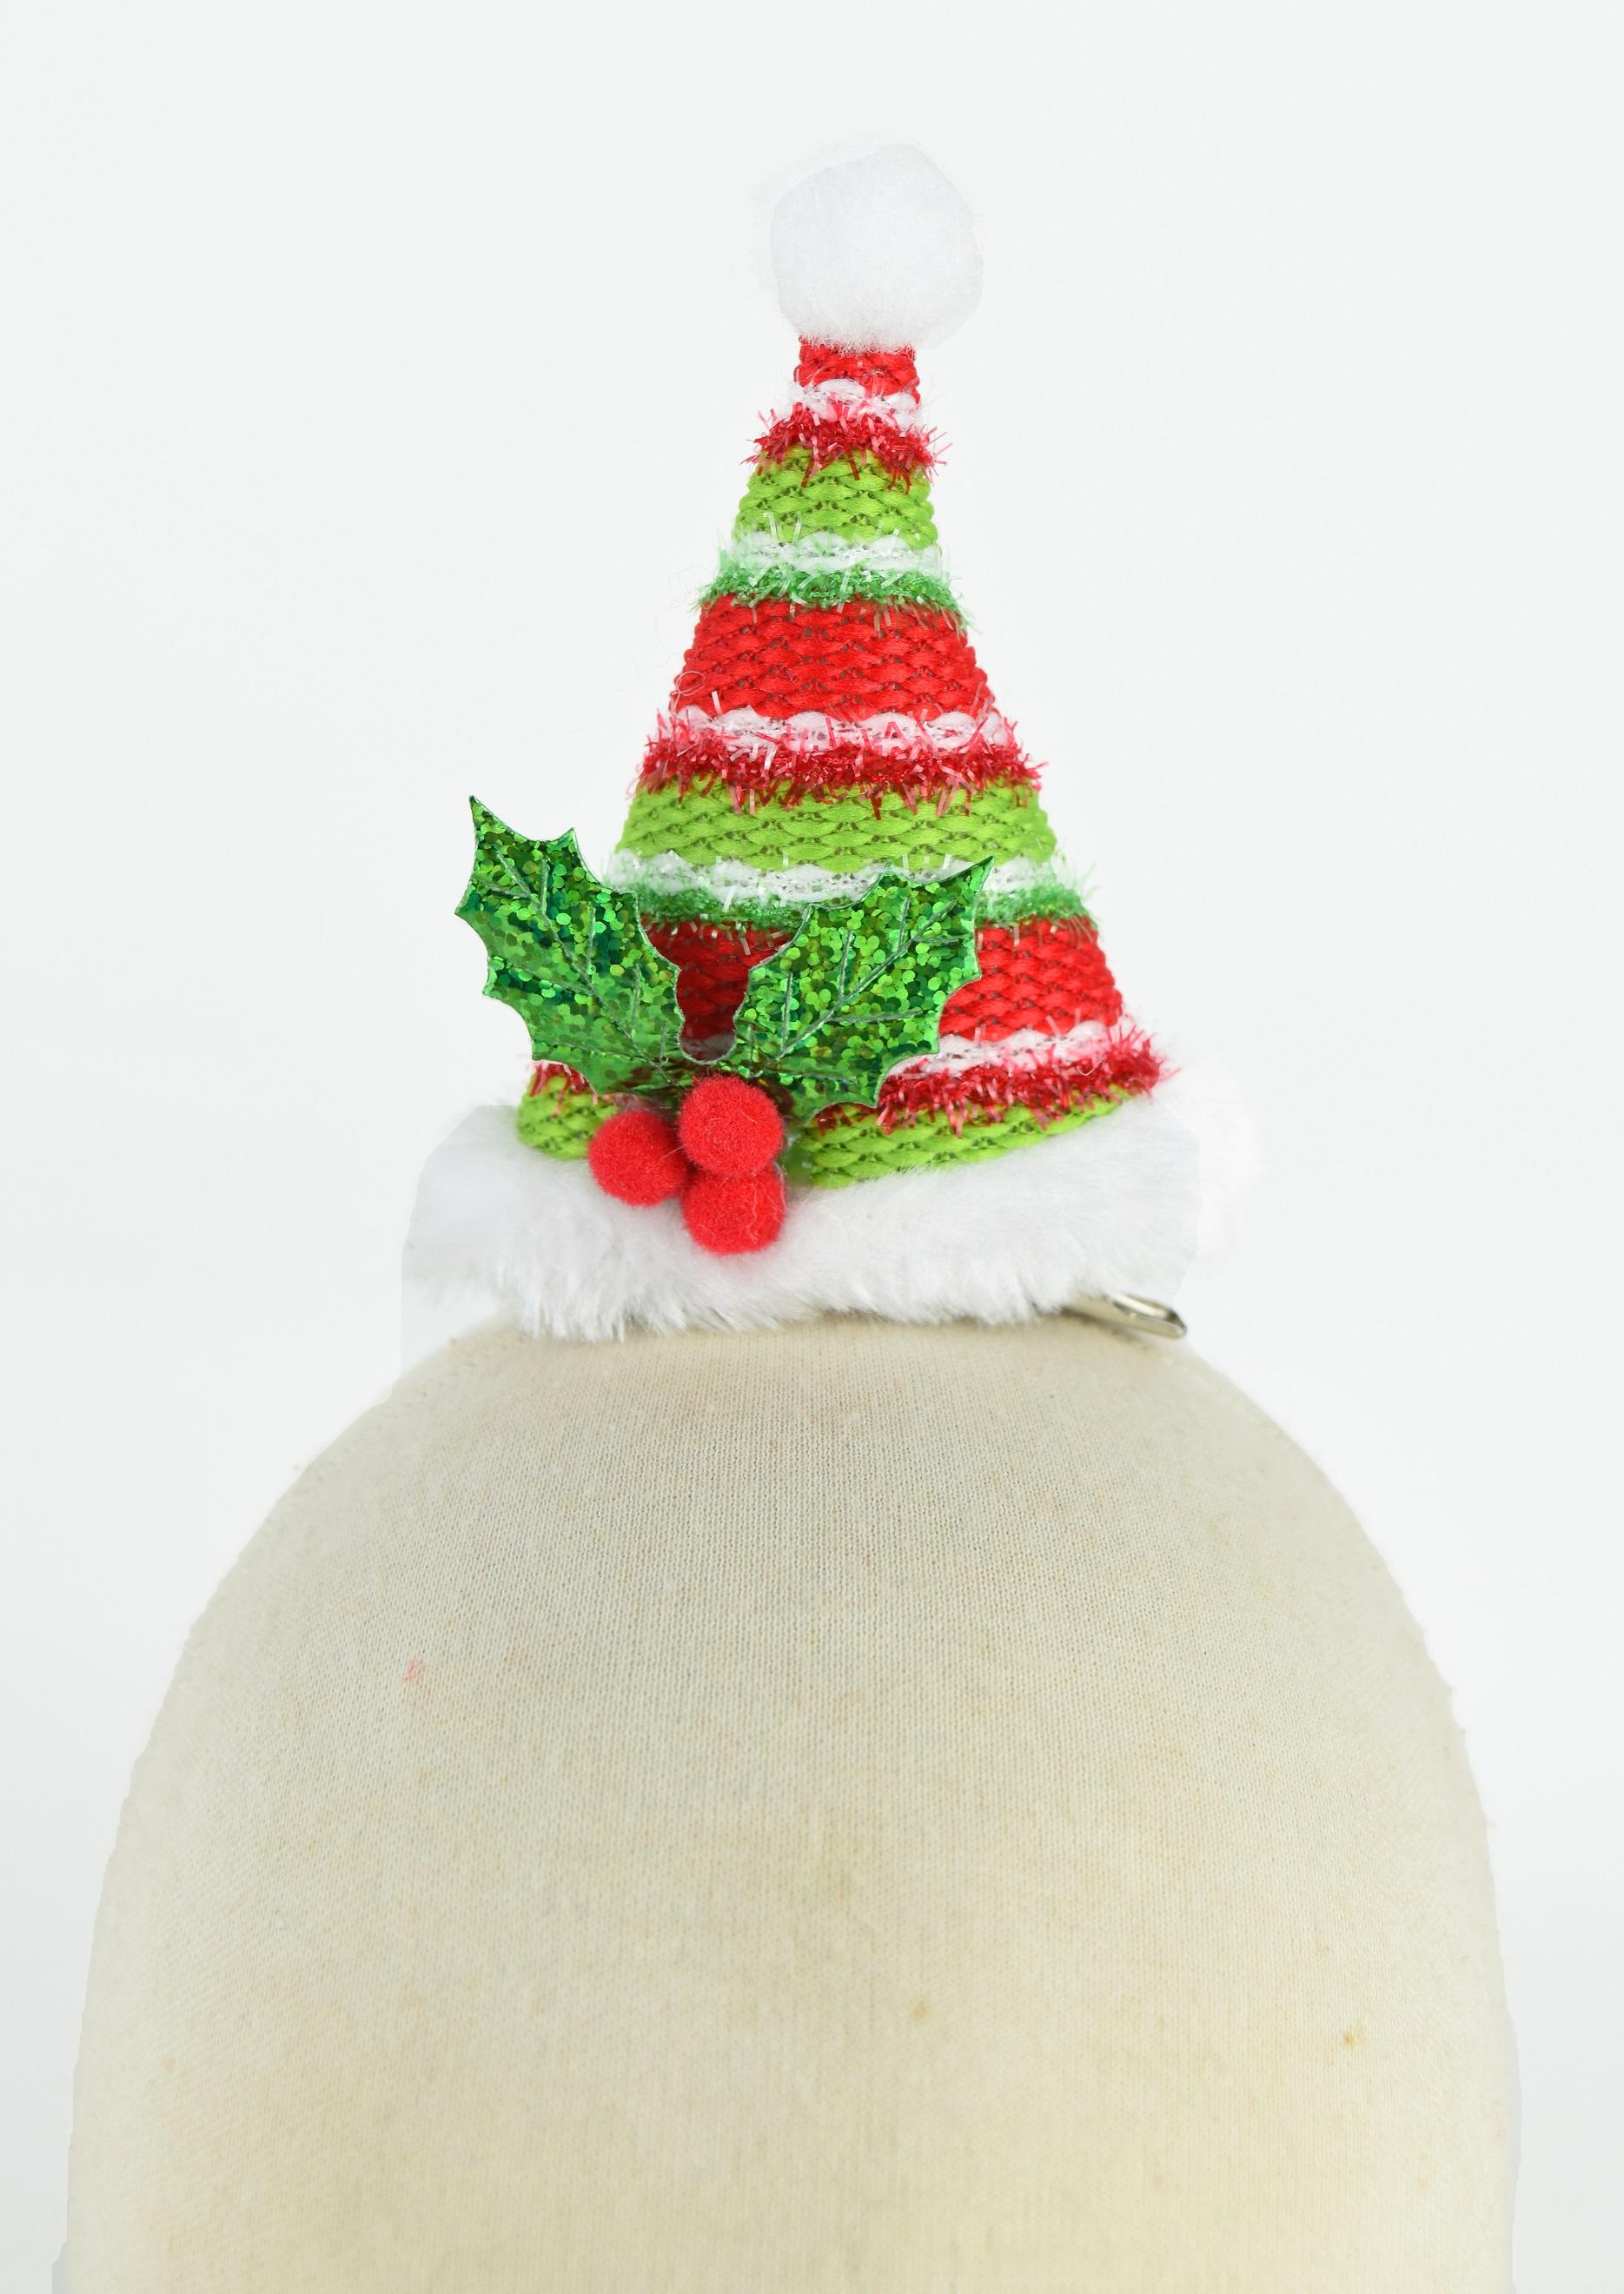 X射線【X412400】立體聖誕帽造型夾,聖誕節/派對用品/舞會道具/cosplay/角色扮演/麋鹿/表演/情趣/園遊會/校慶